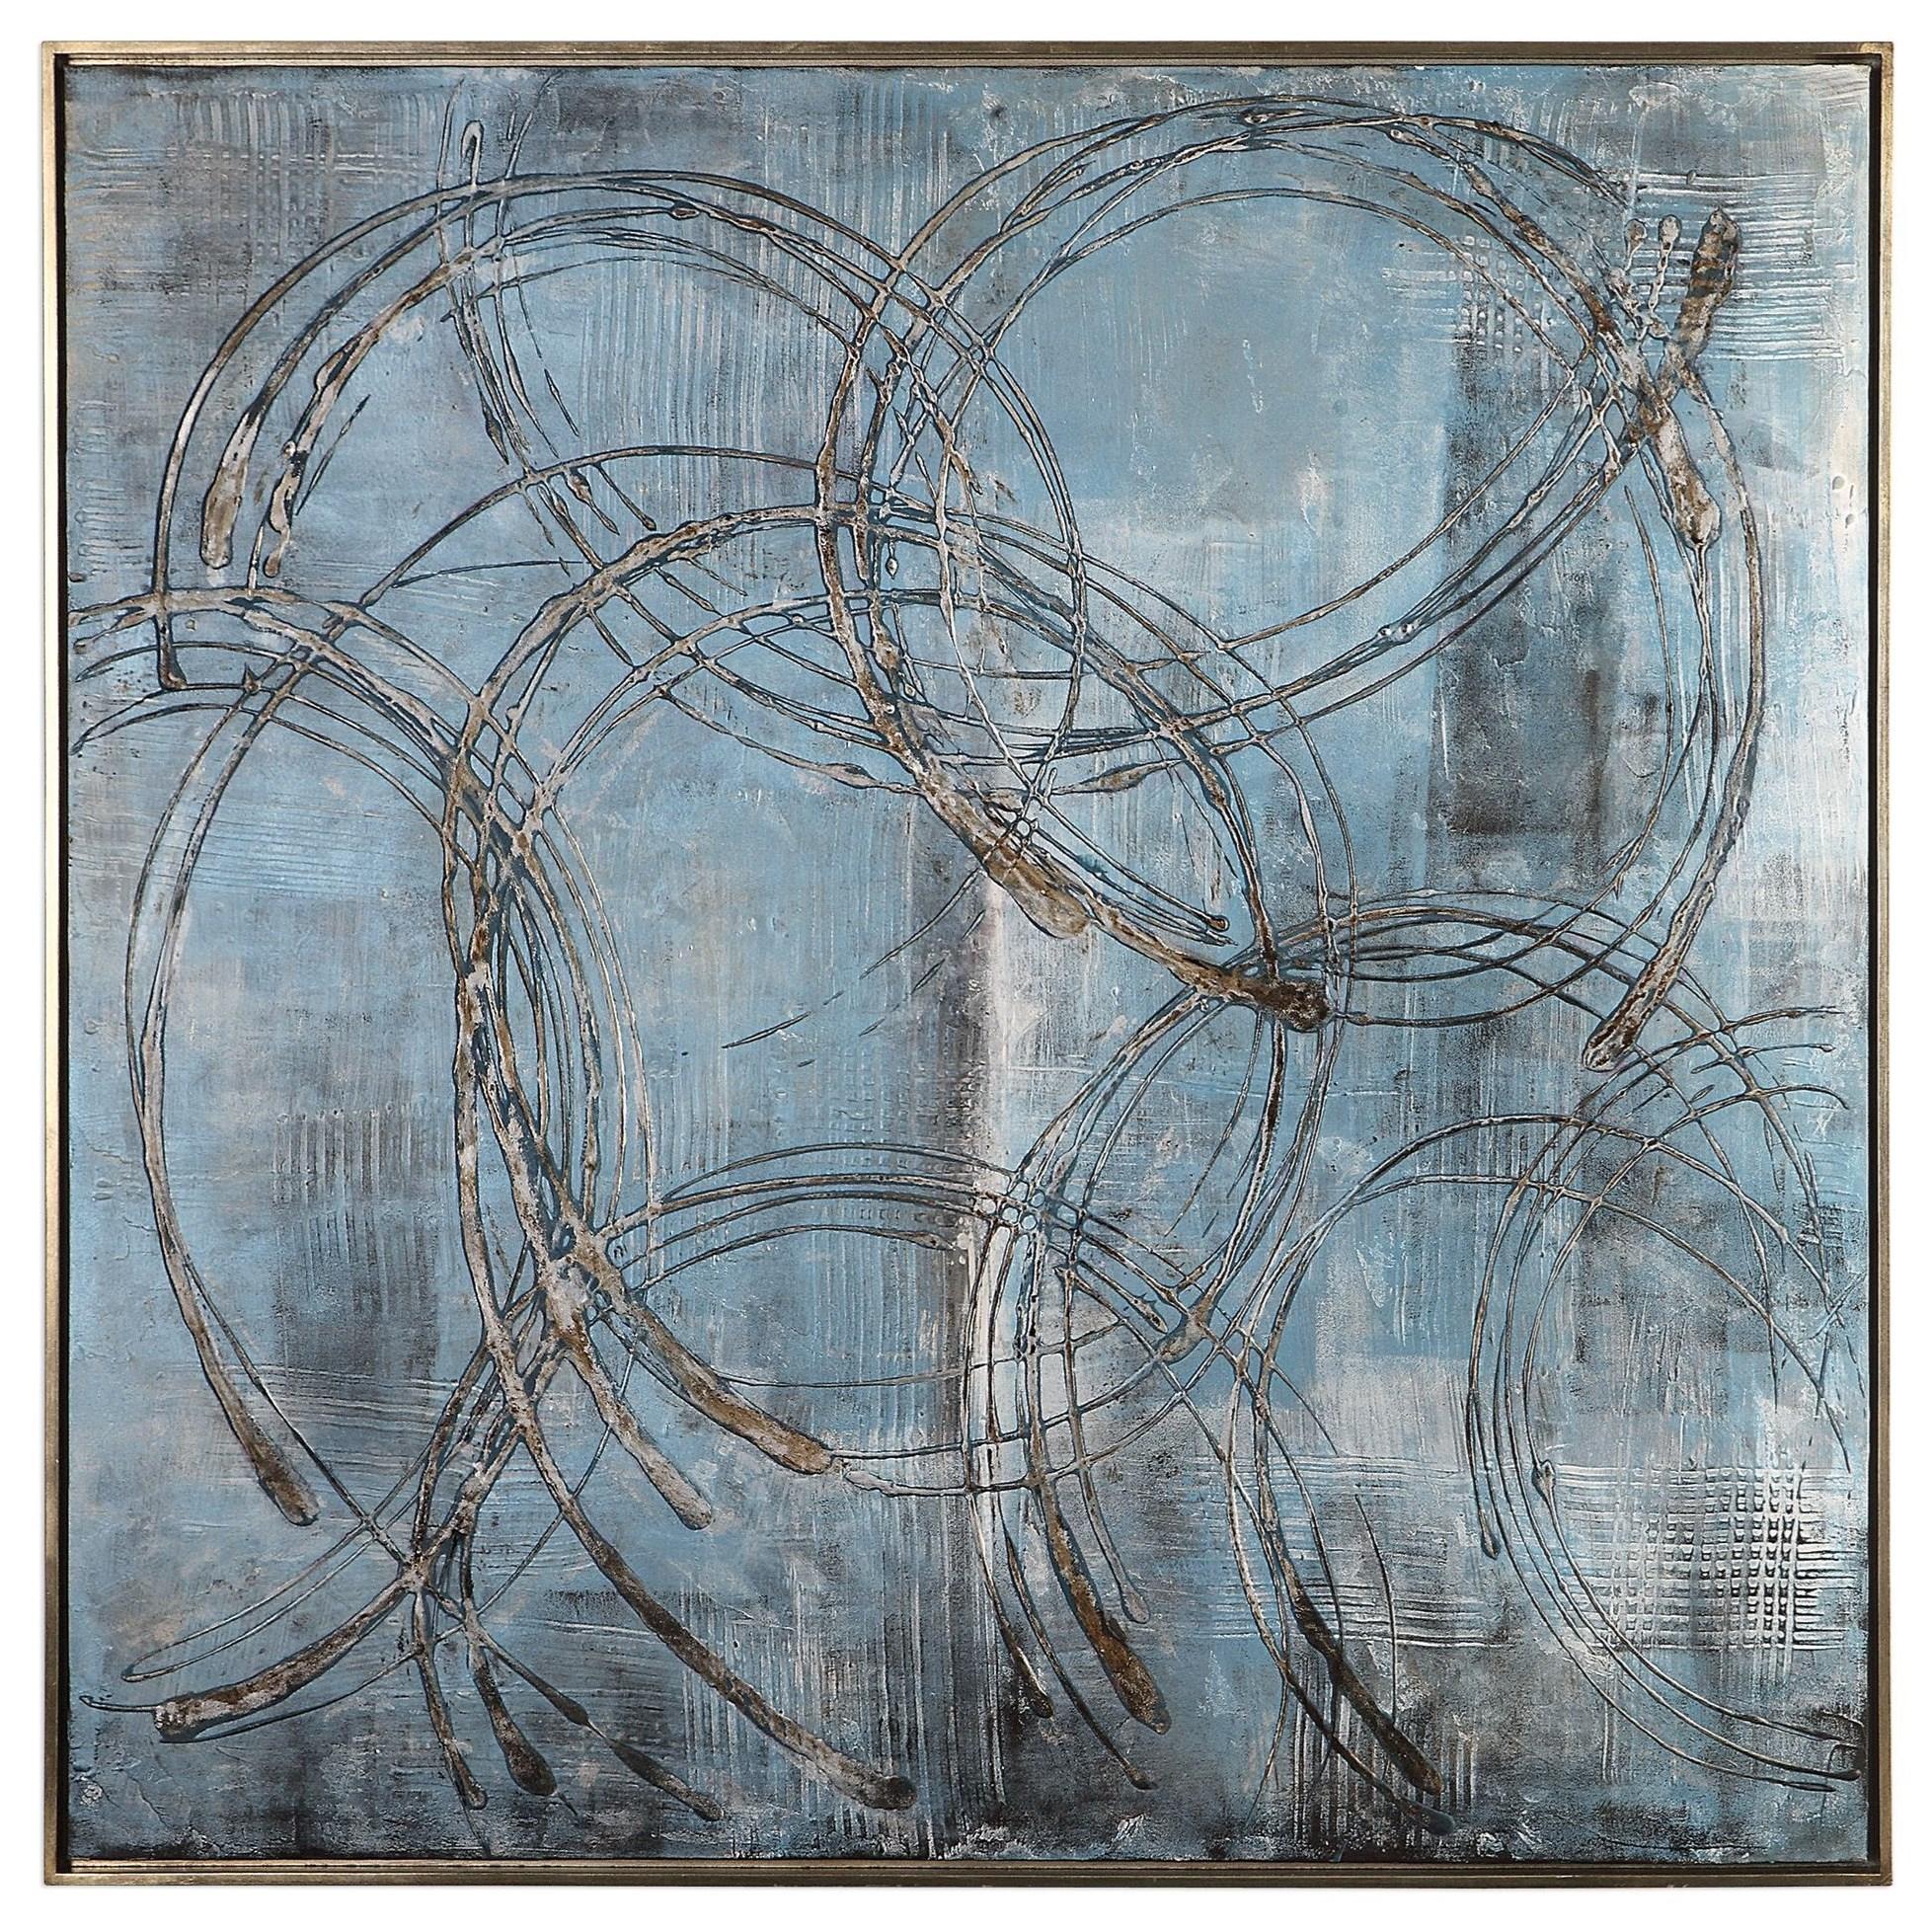 Art Interlock Modern Art by Uttermost at Suburban Furniture